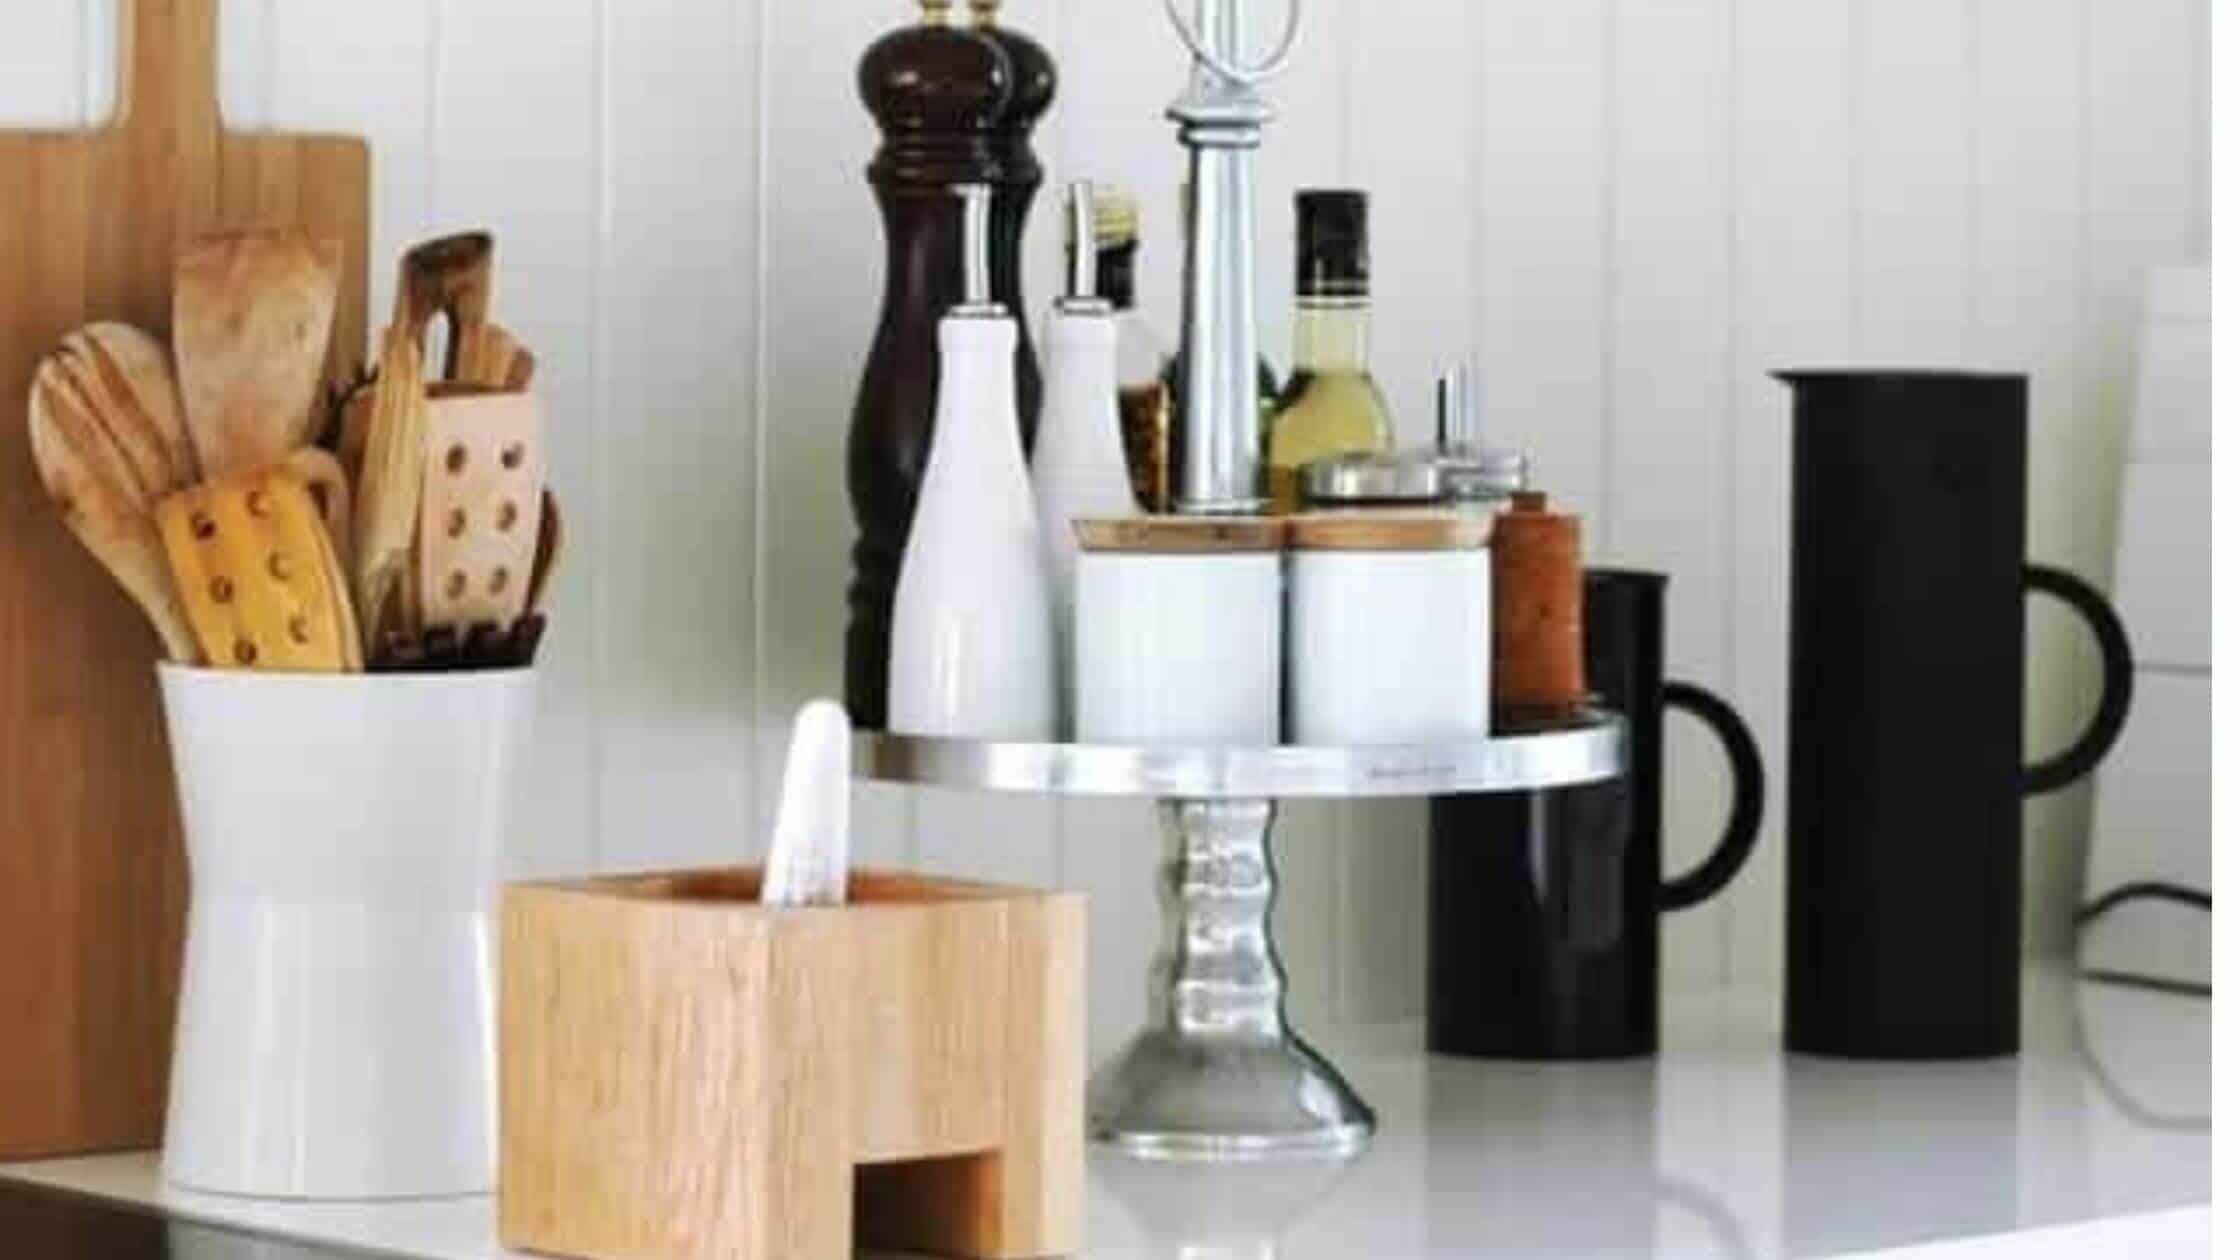 Kitchen Countertop Storage Solutions